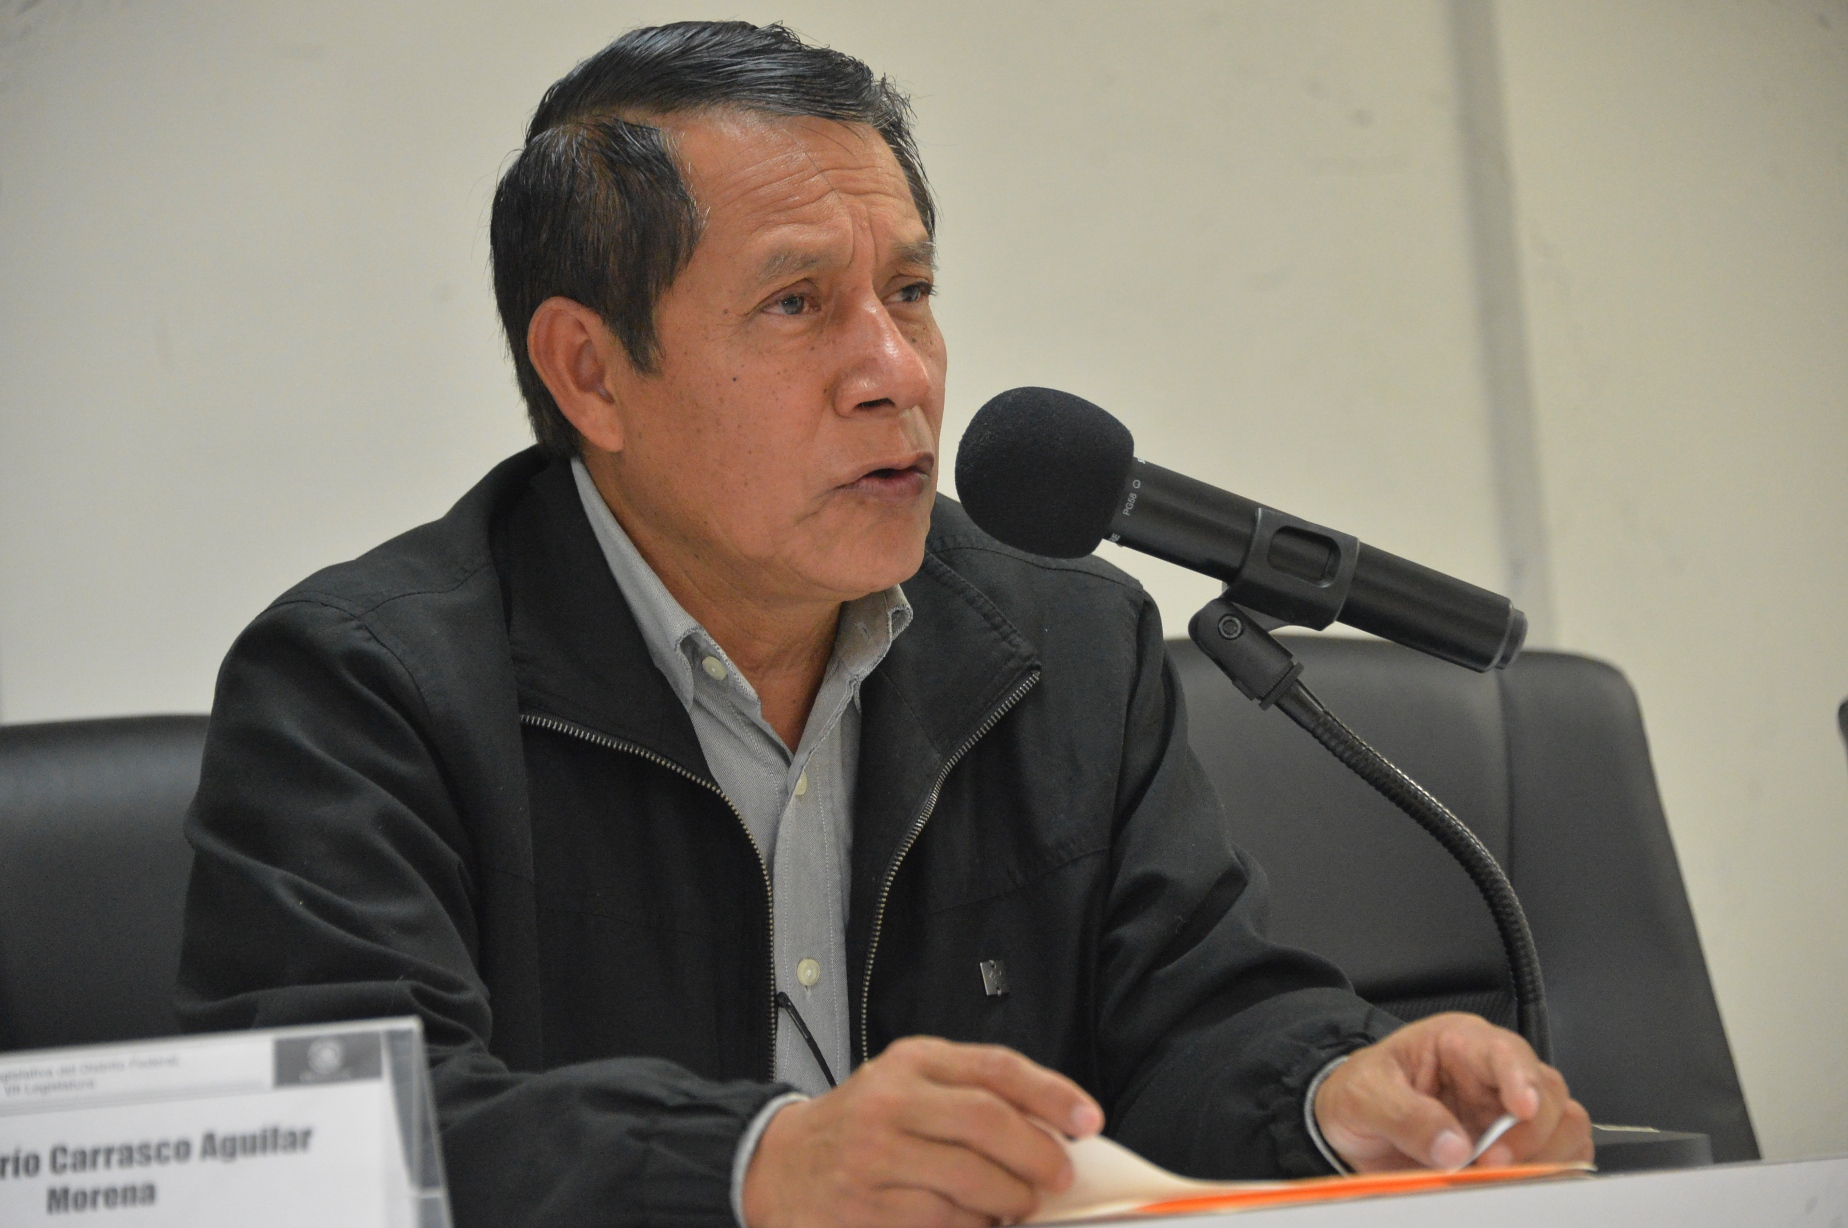 URGE DARÍO CARRASCO GARANTIZAR SEGURIDAD HUMANA DE CAPITALINOS